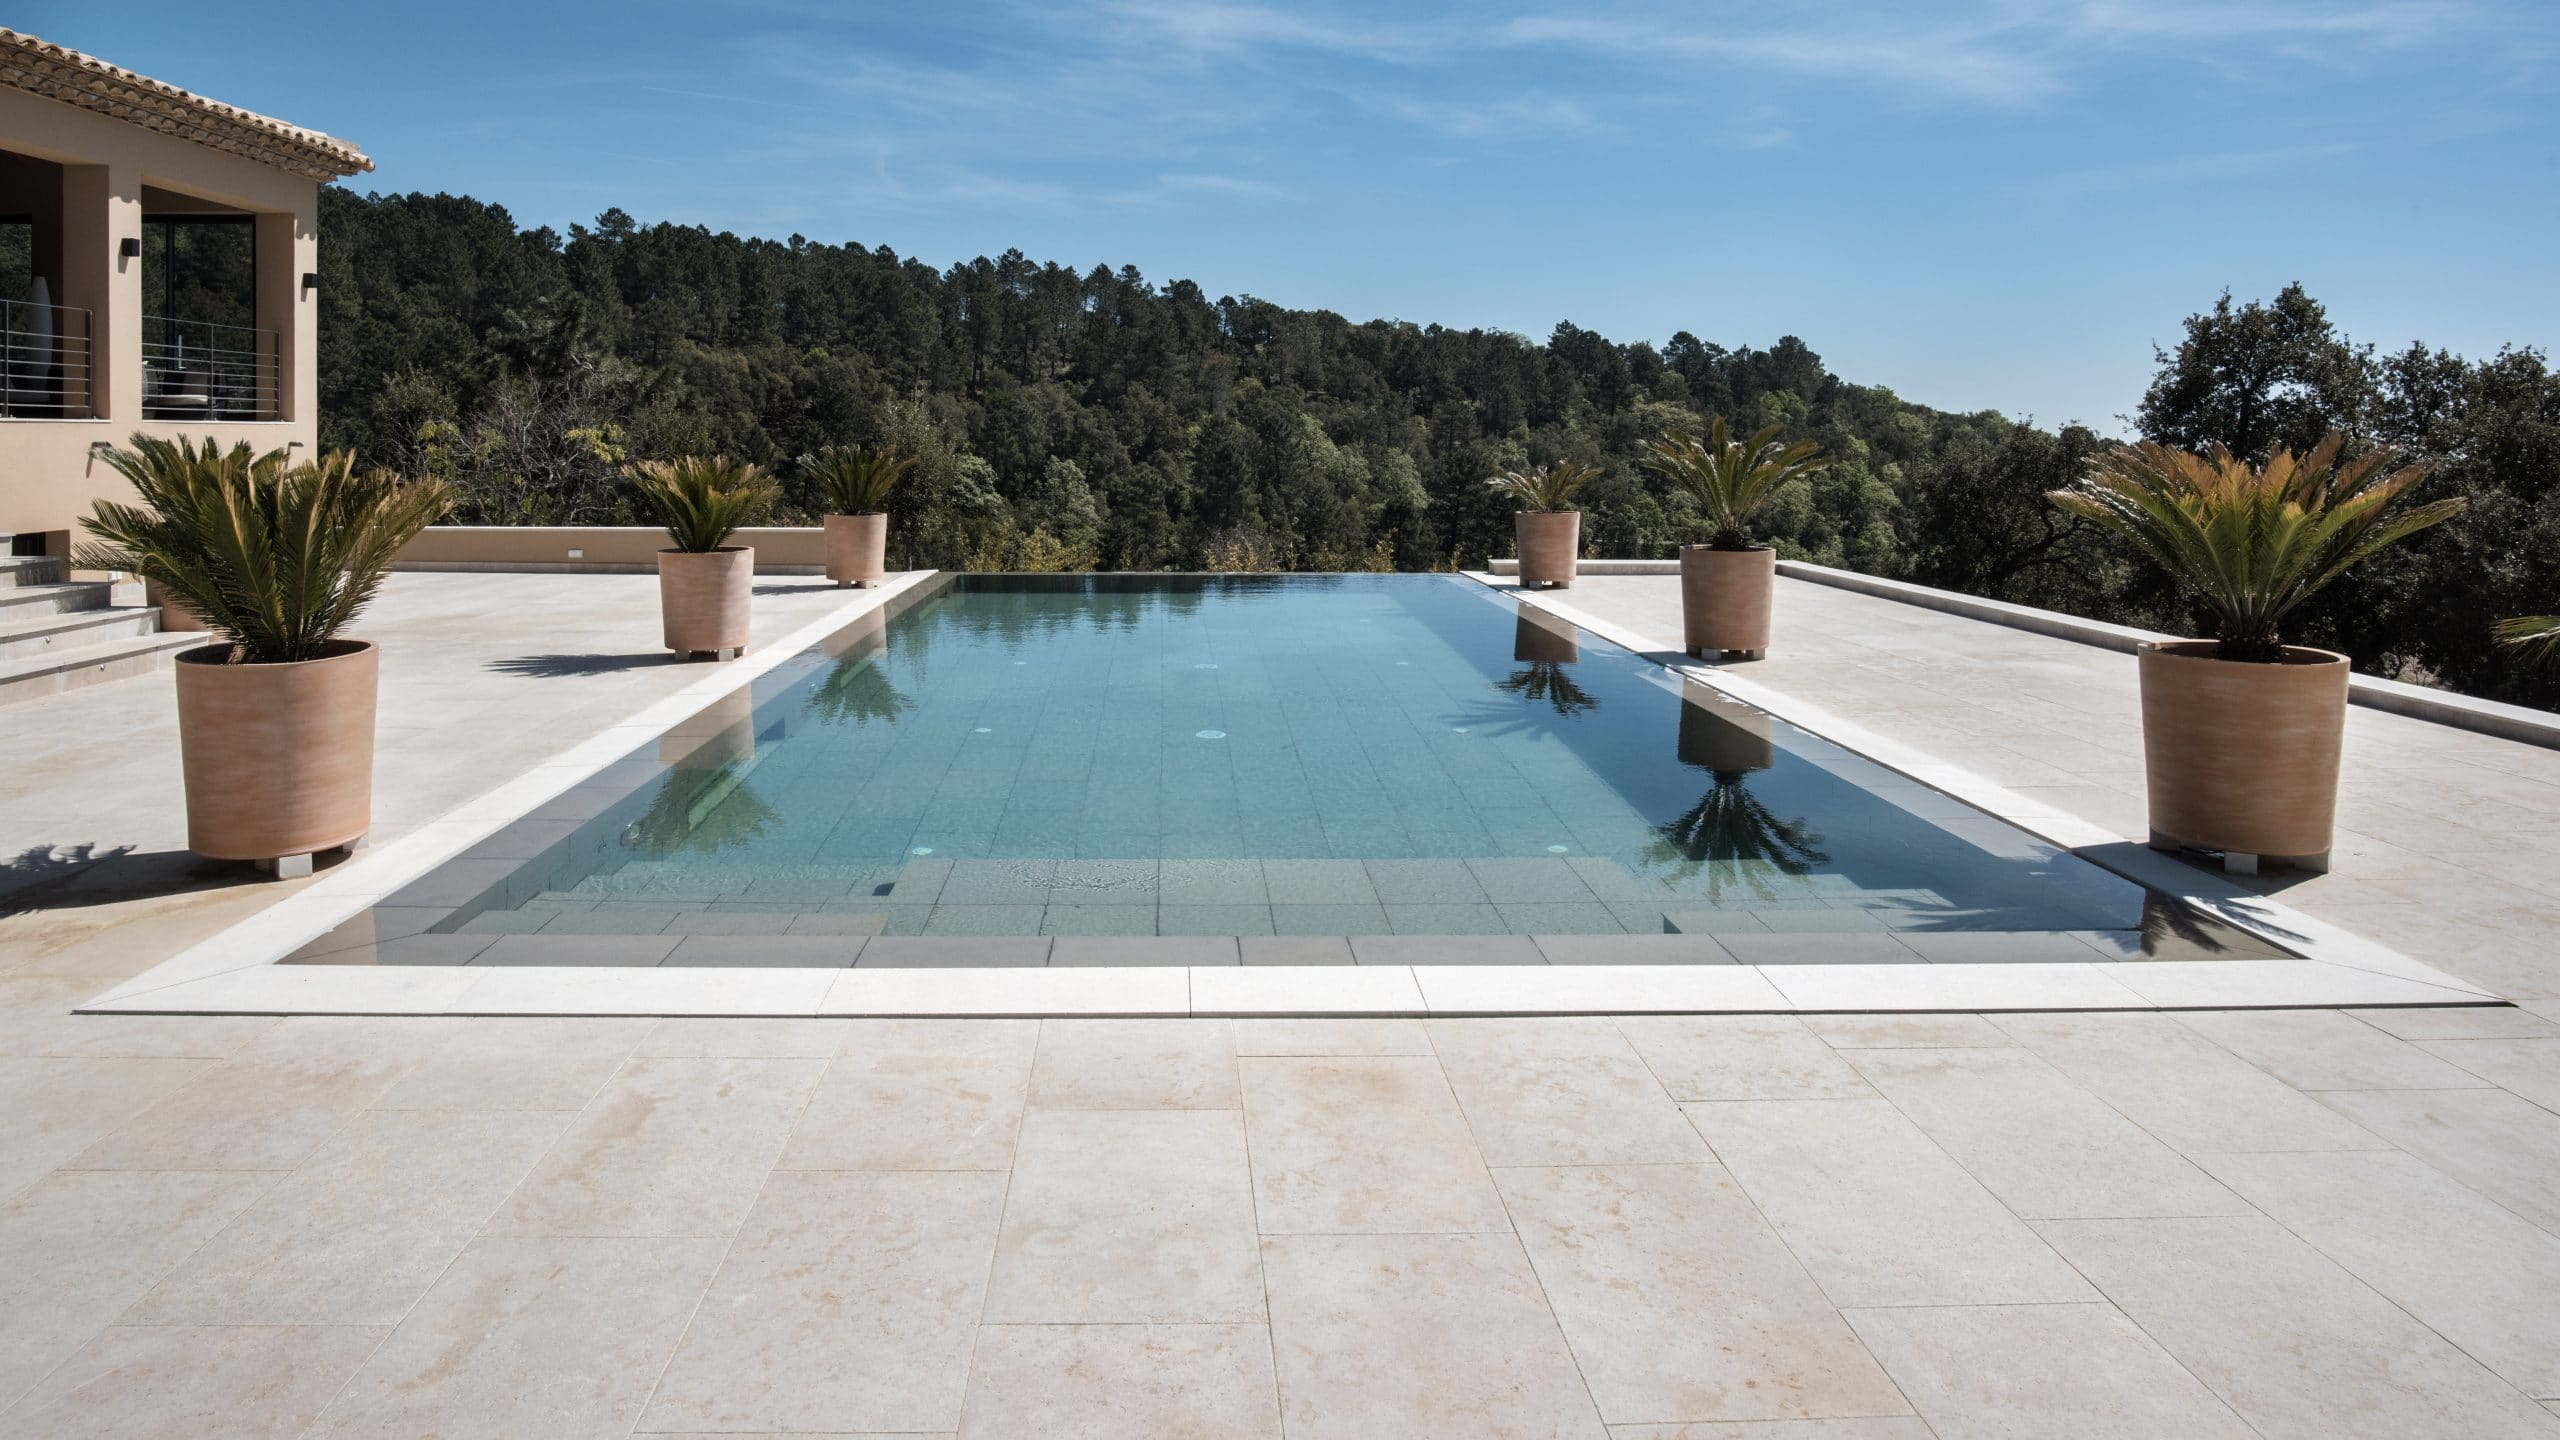 Plage de piscine et margelles en pierres beige Cèdre Gray - Dalle en pierre fond de piscine en Forest Grey